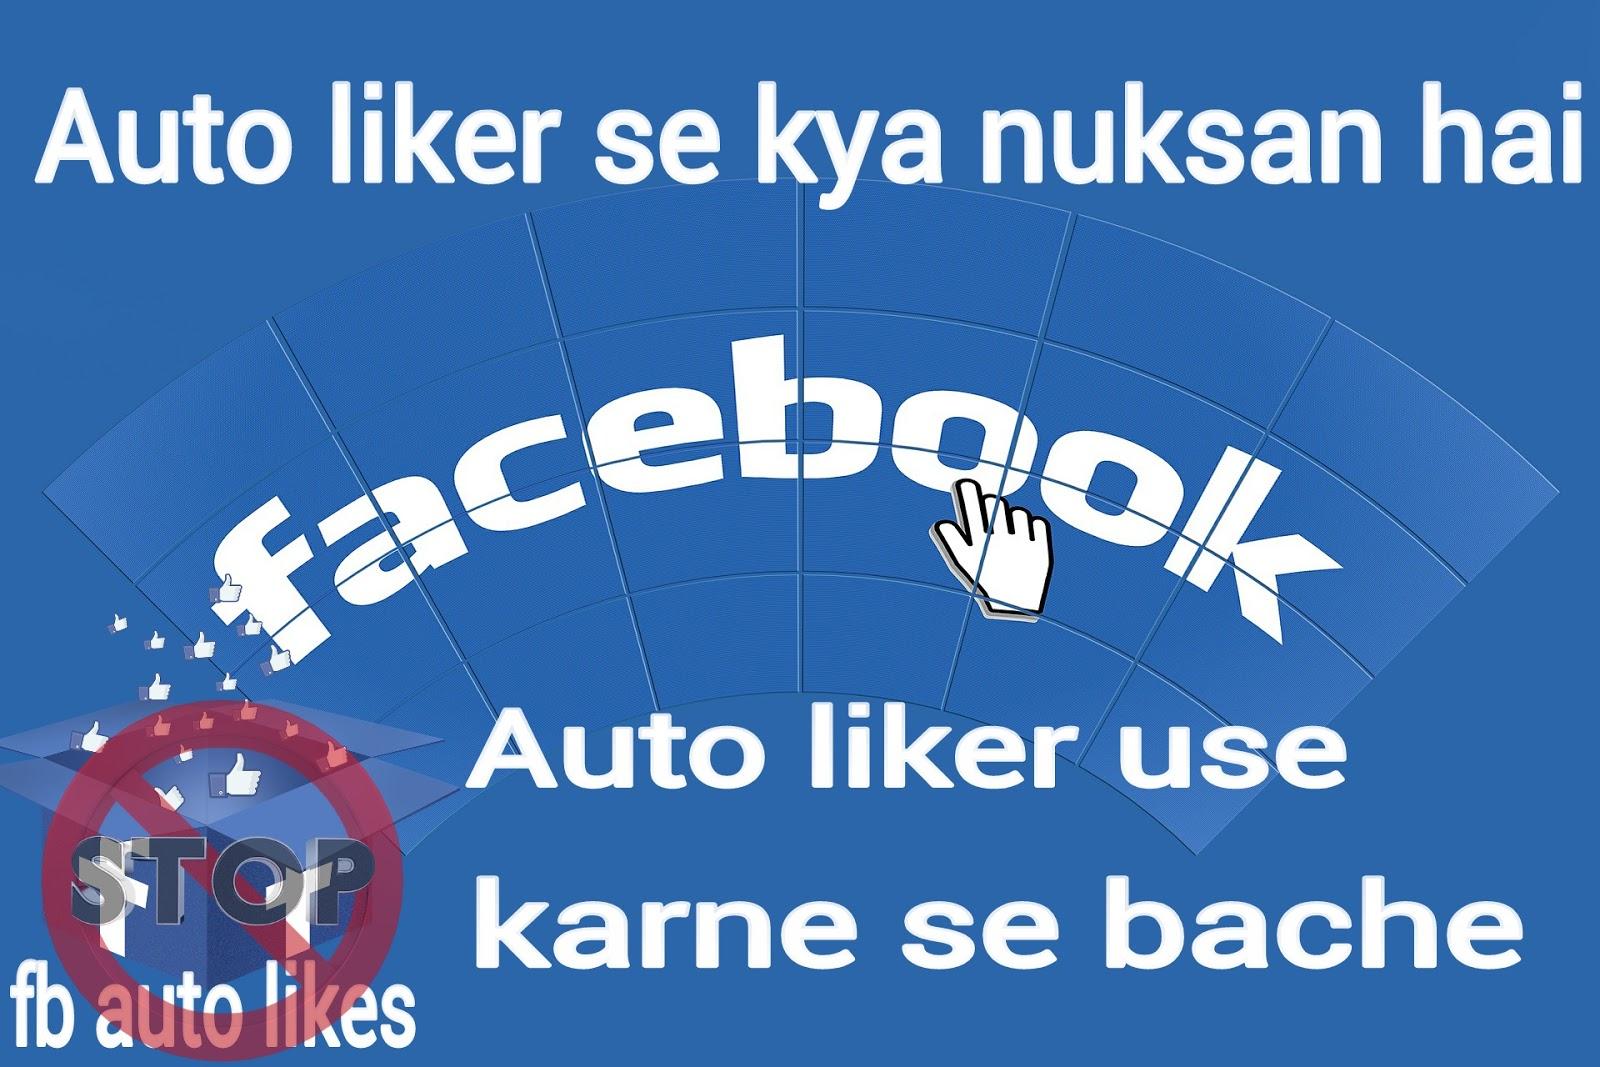 automatic liker